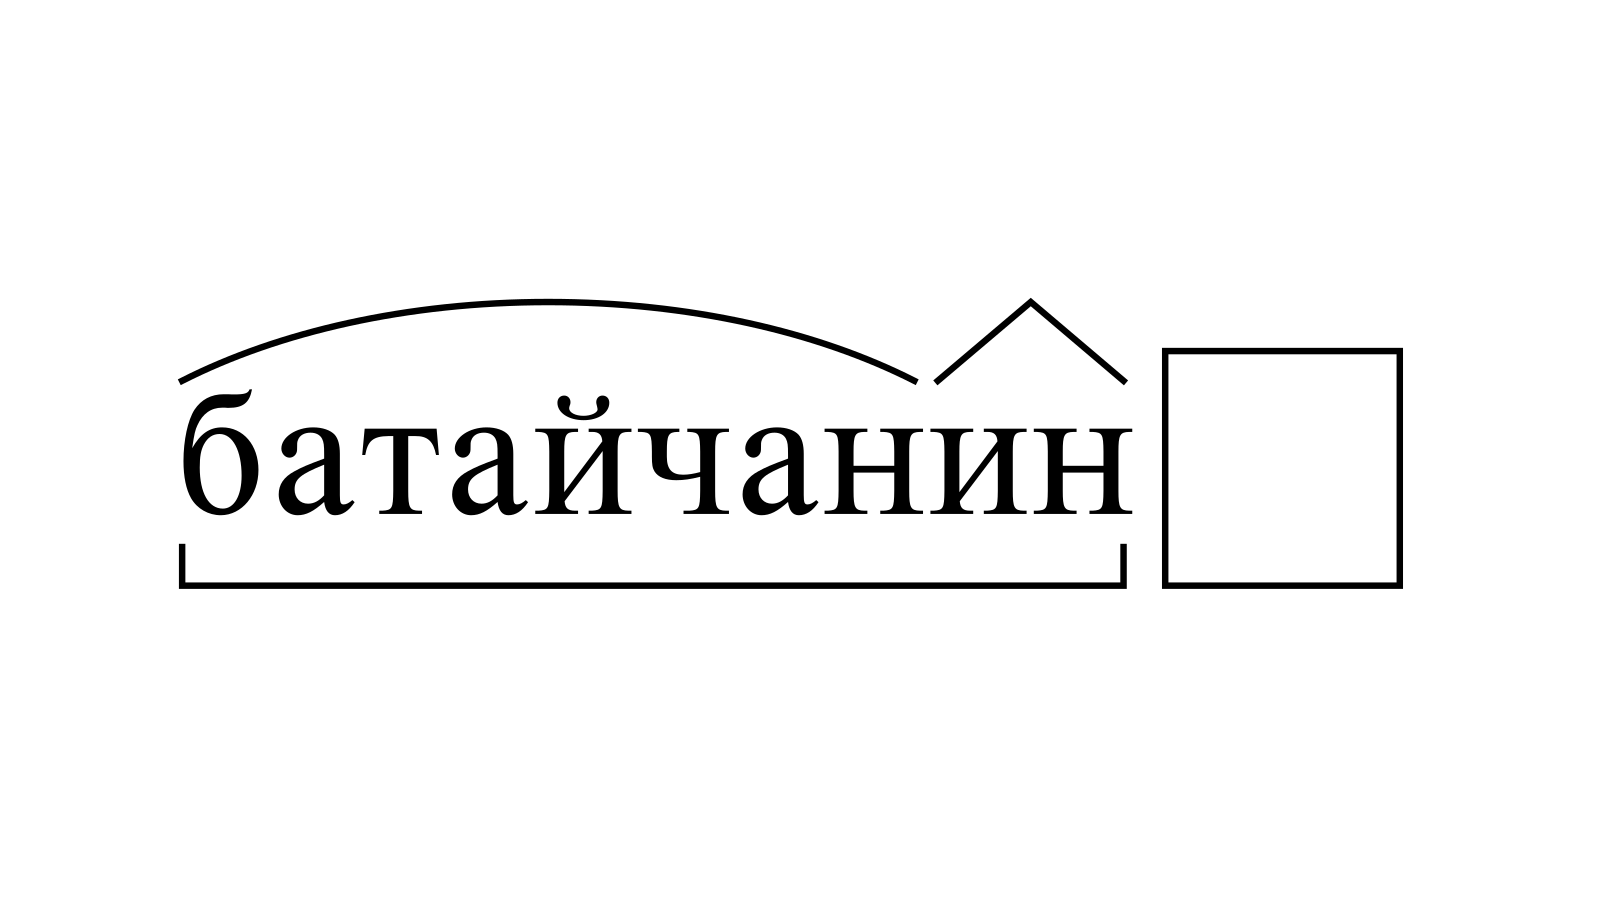 Разбор слова «батайчанин» по составу